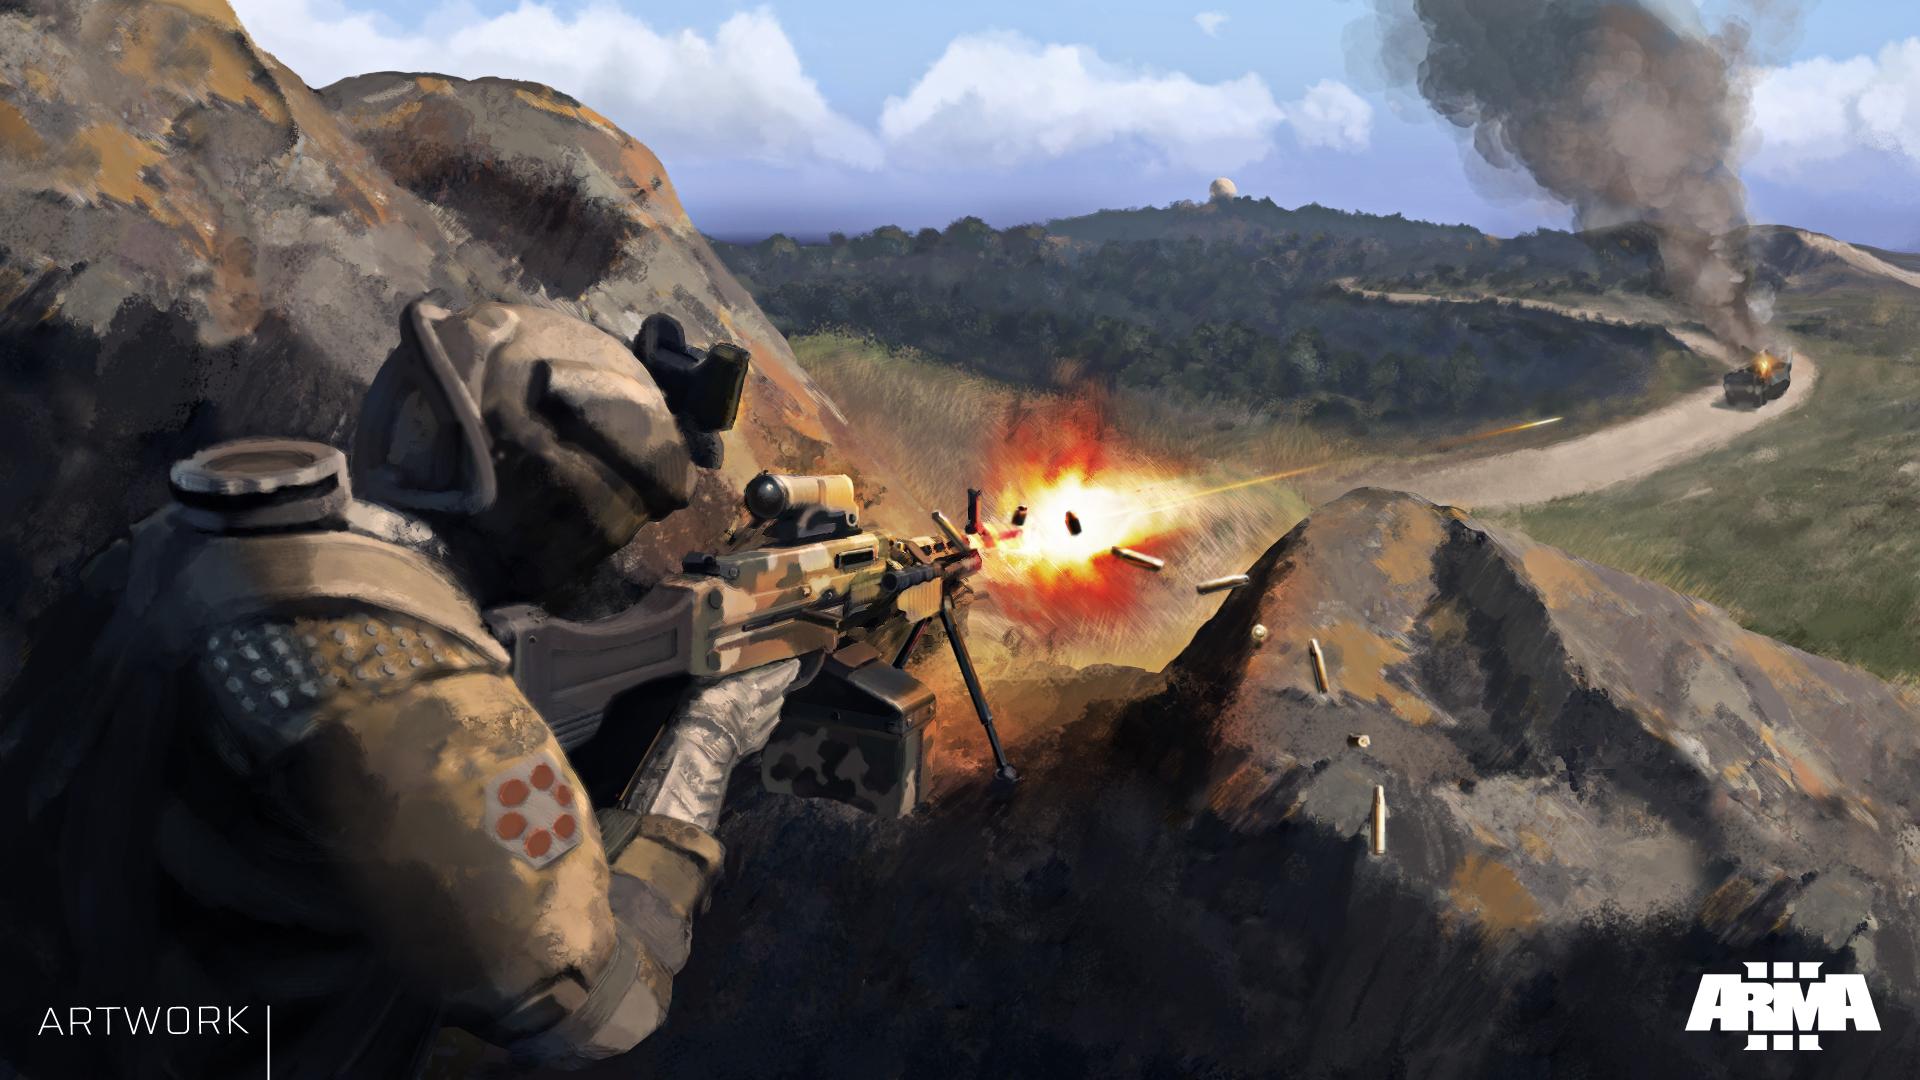 arma 3 marksmen dlc available on april 8th gamingshogun